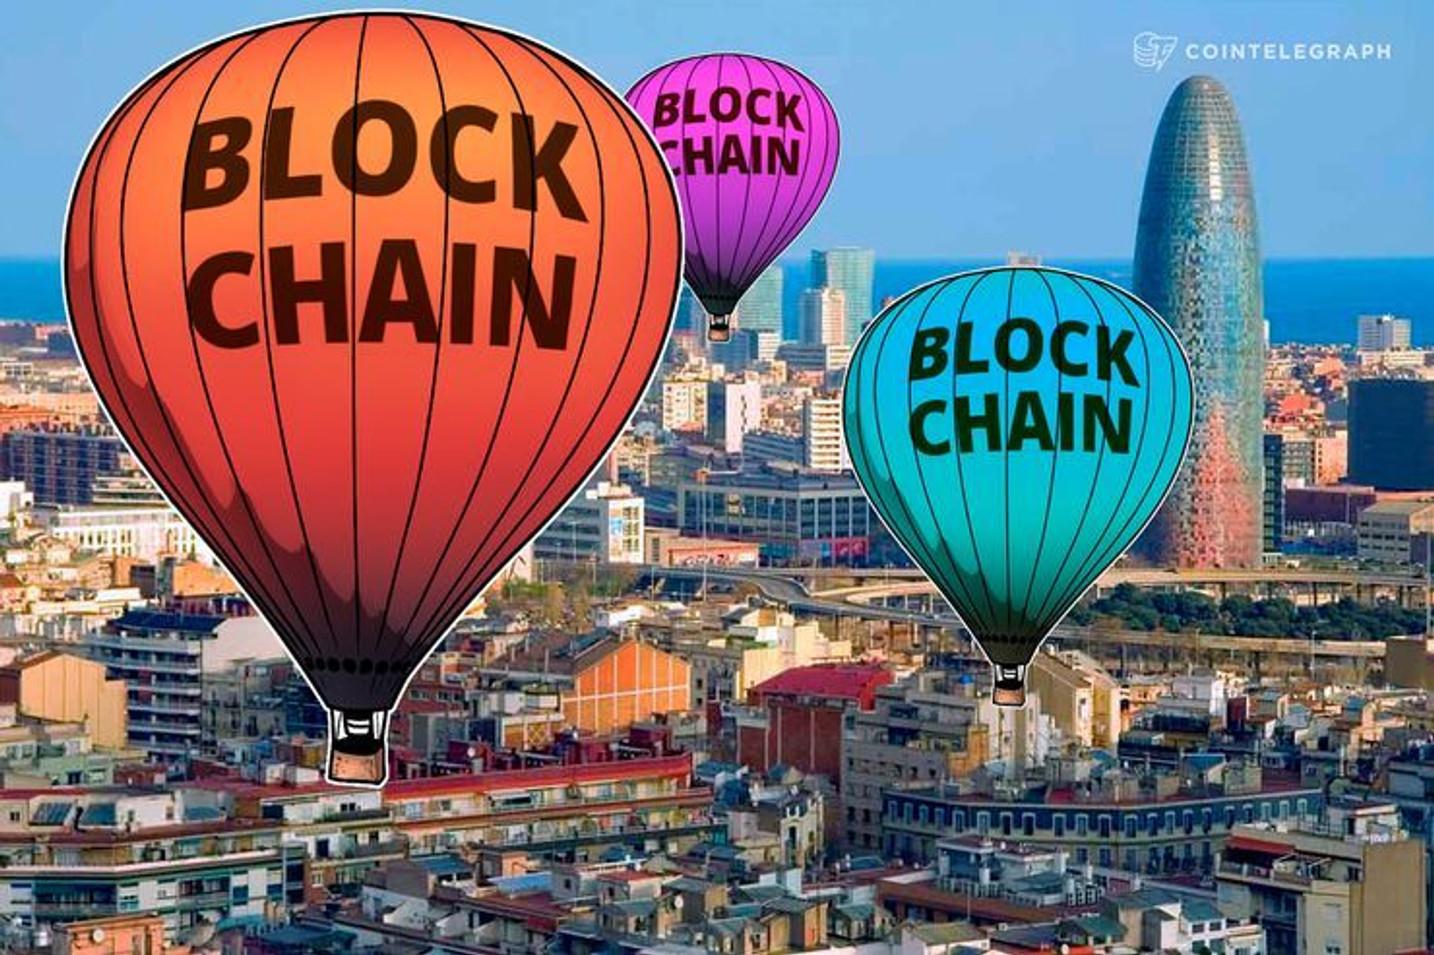 European Blockchain Convention eligió a 21 startups para participar de un encuentro en Barcelona